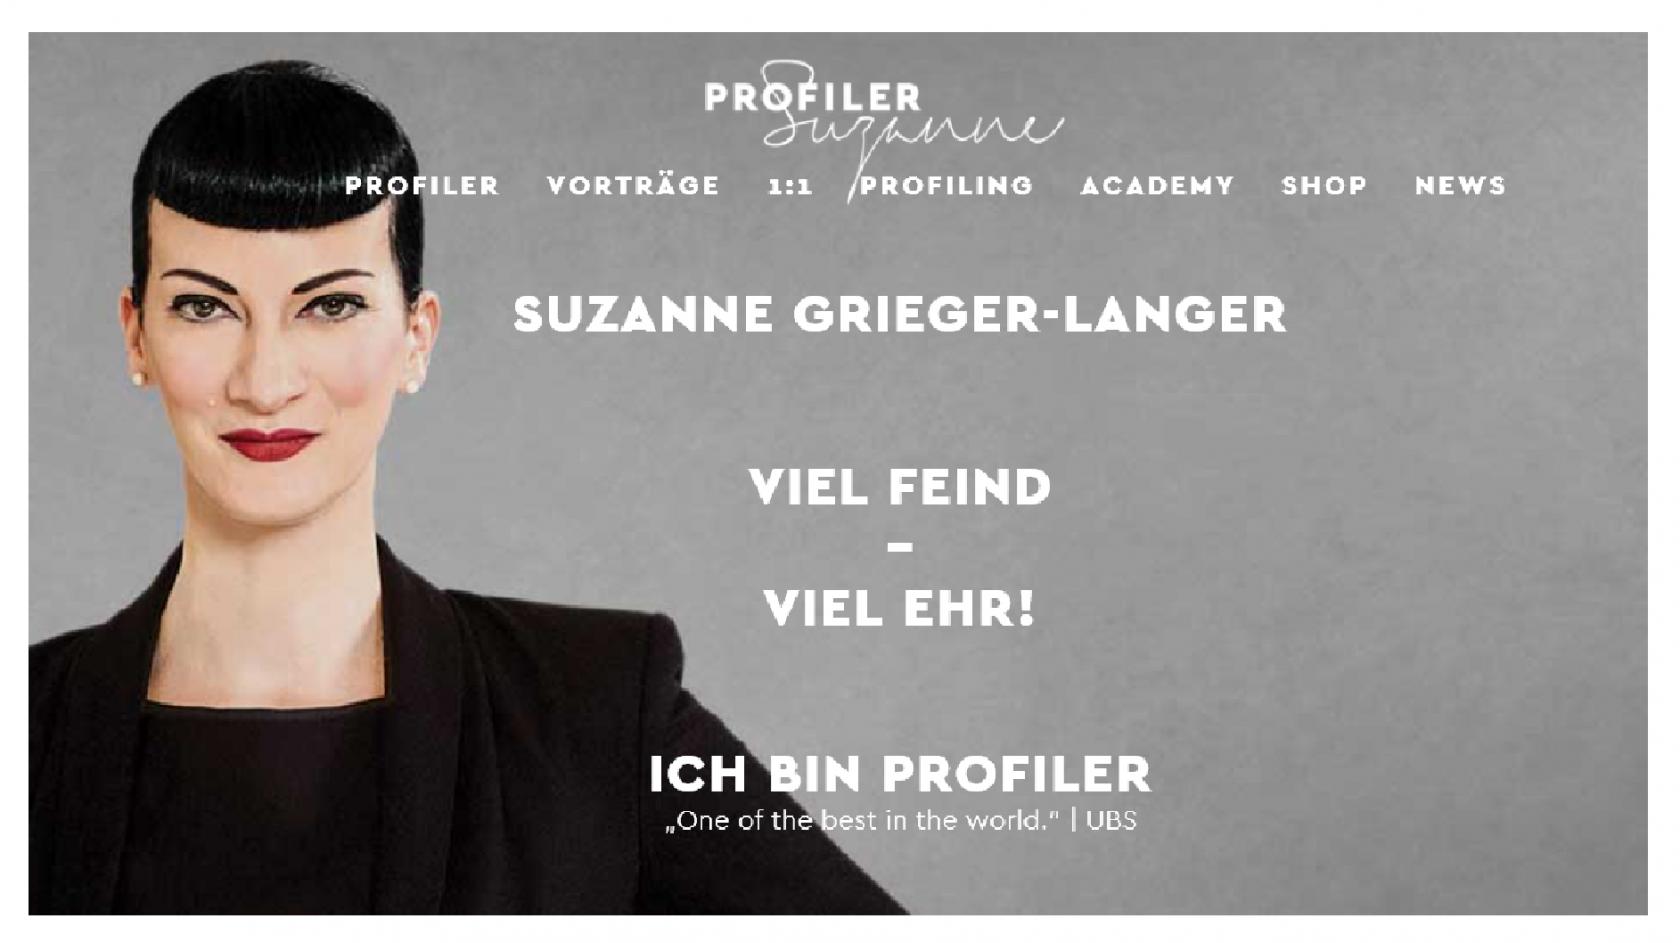 Suzanne Grieger-Lange